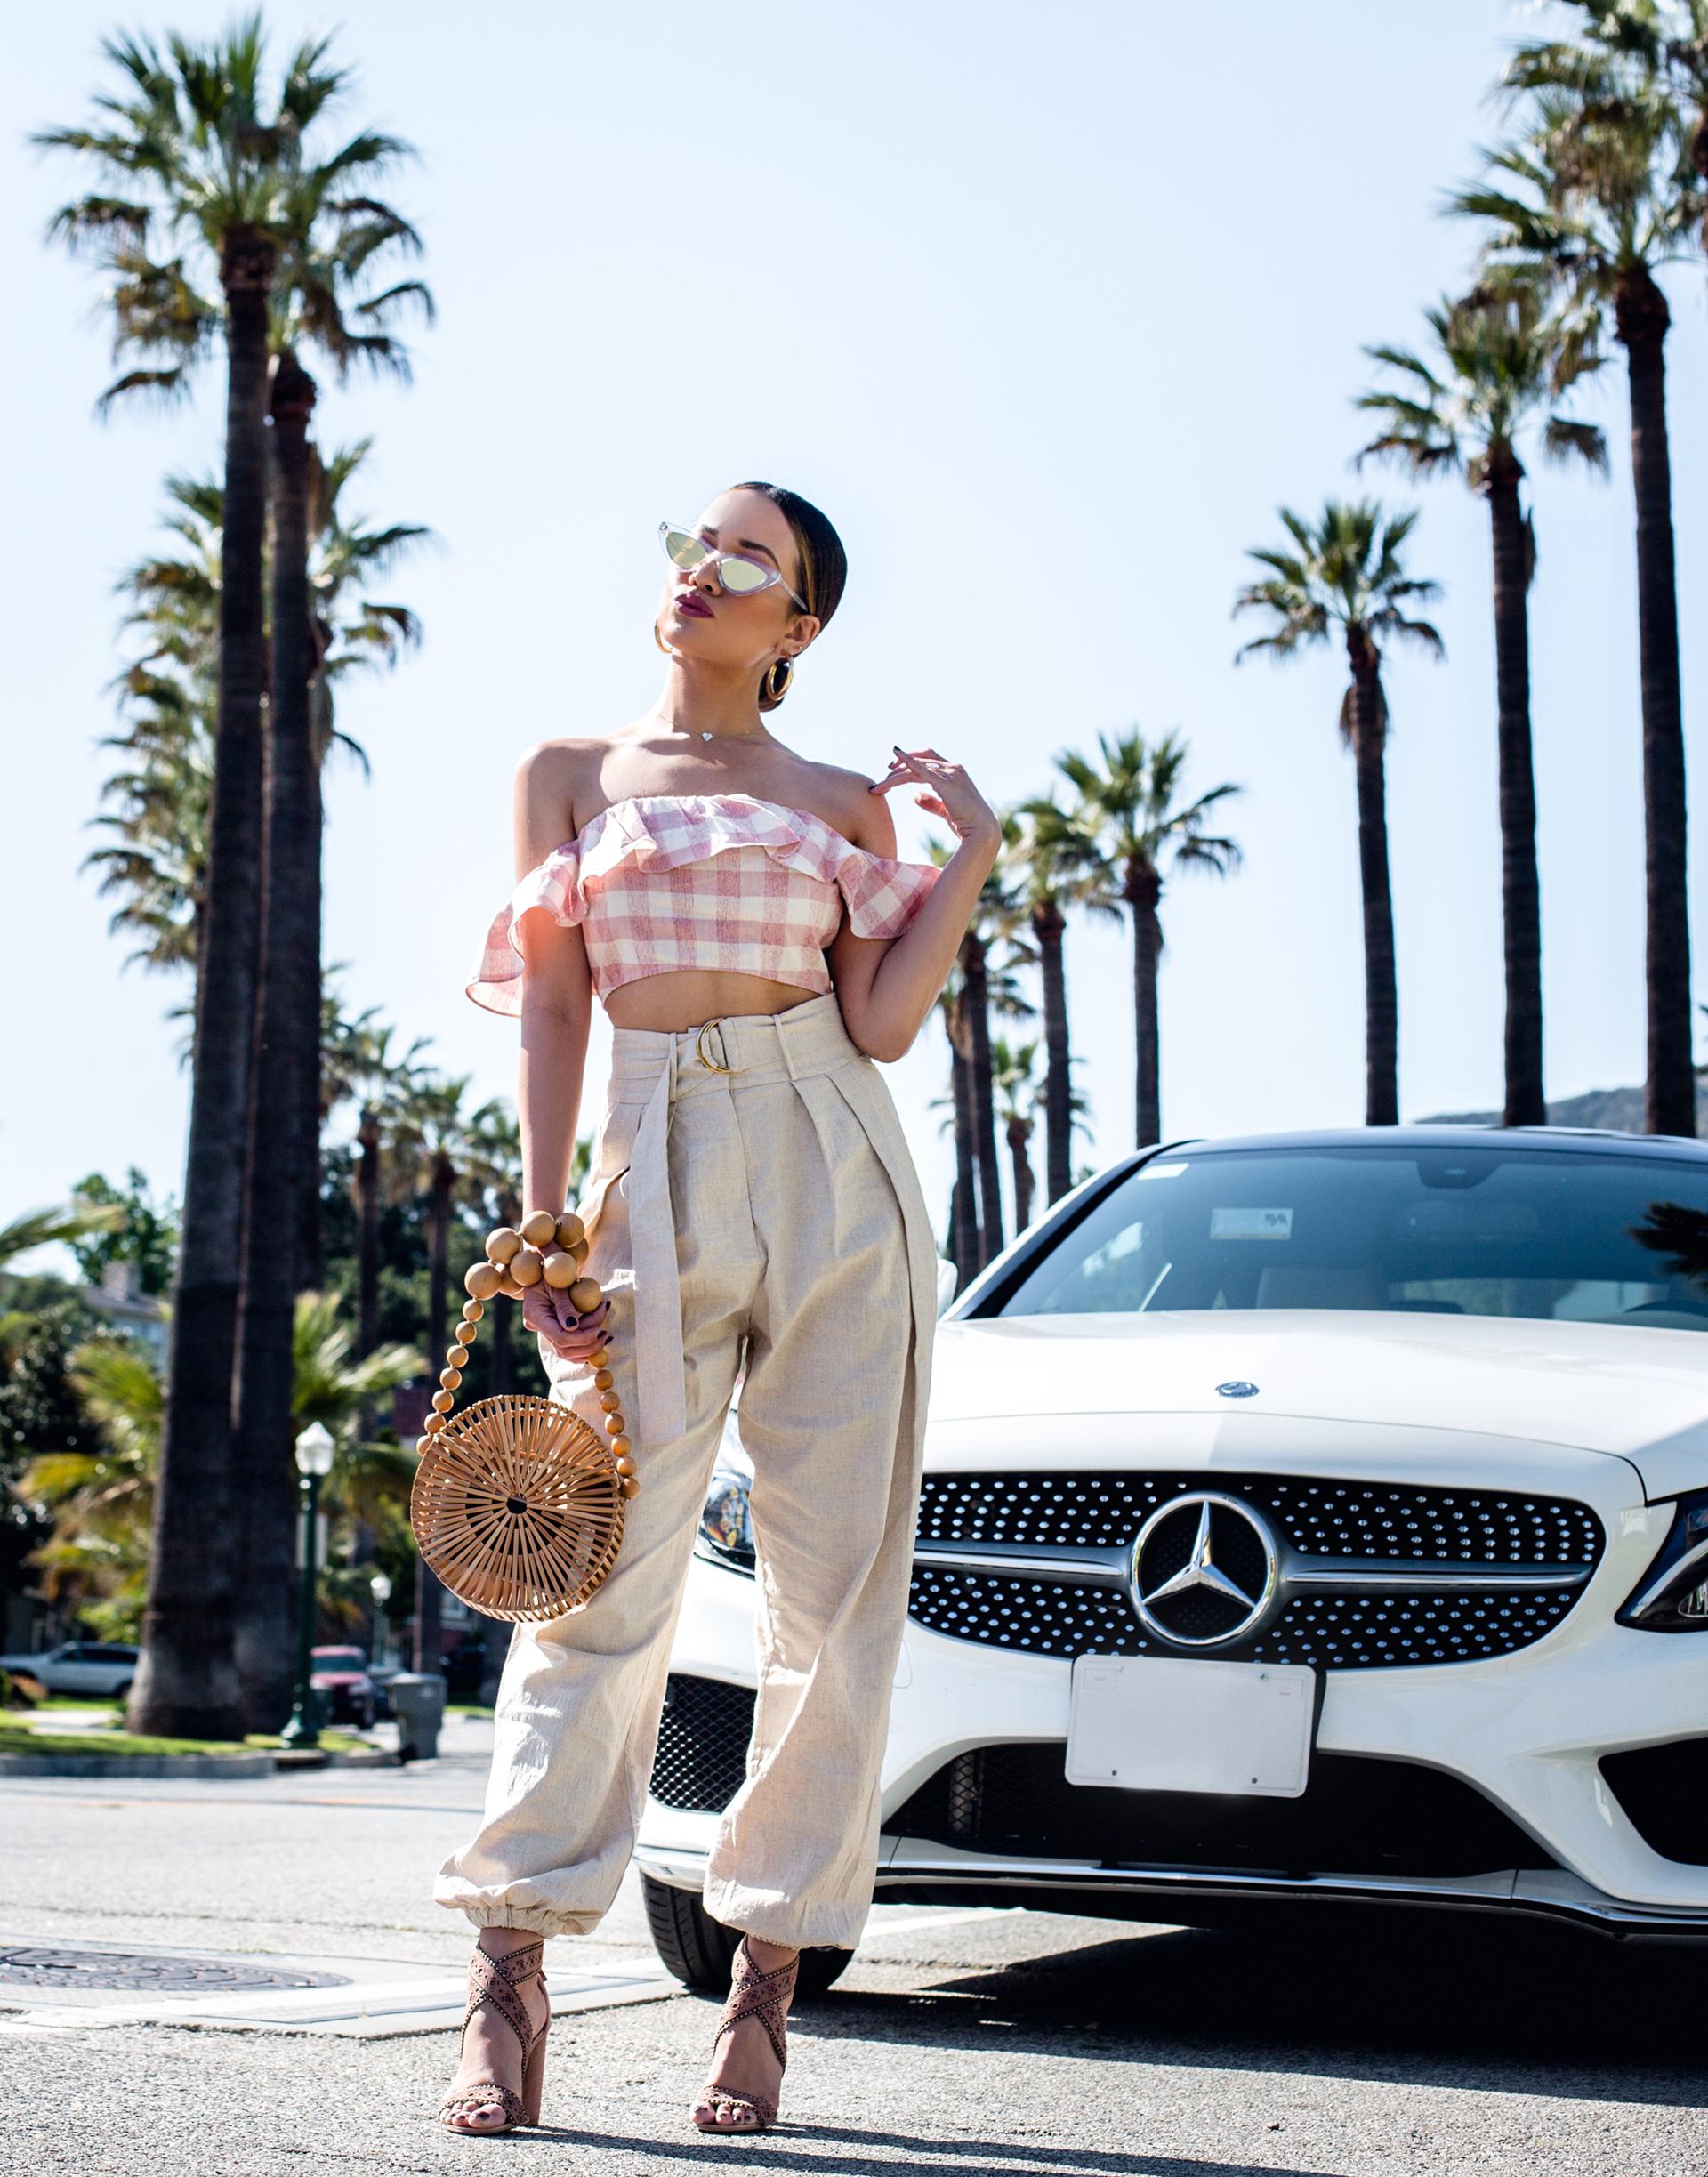 Jessi Malay Revolve Tularosa Pants Coachella Outfit